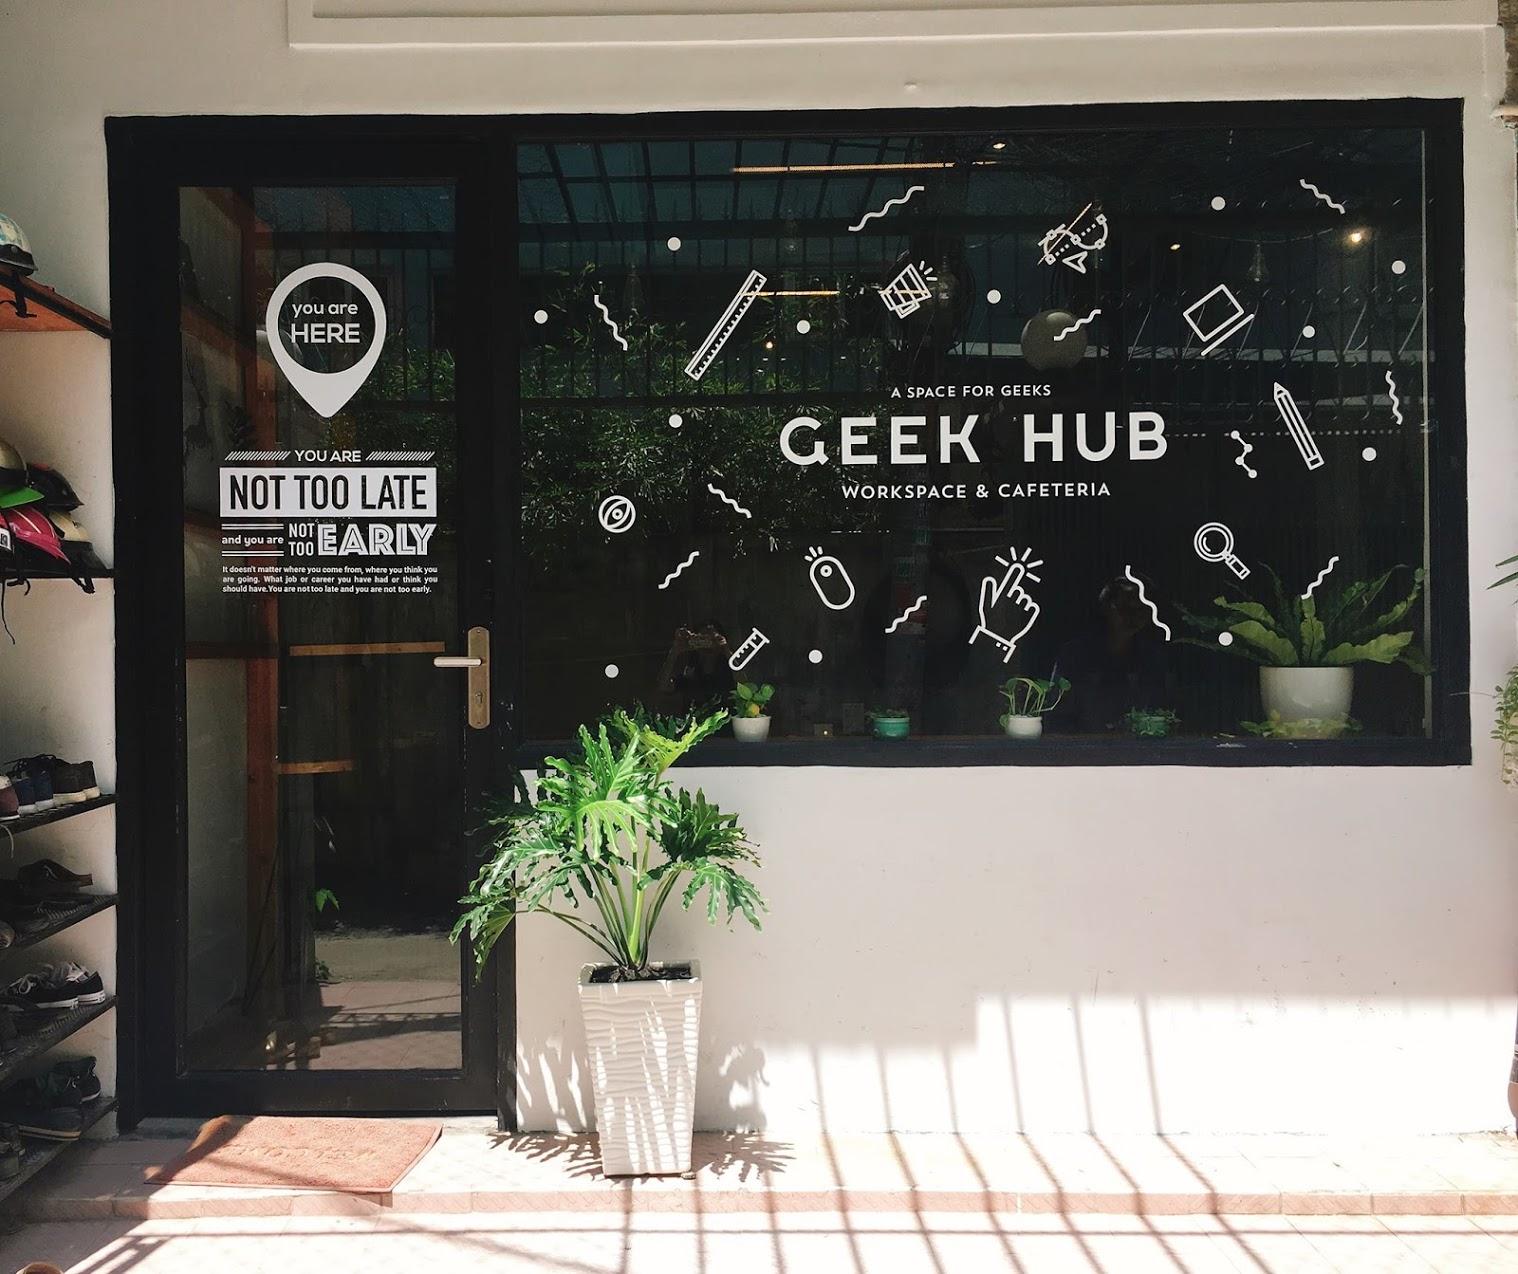 Geek-hub